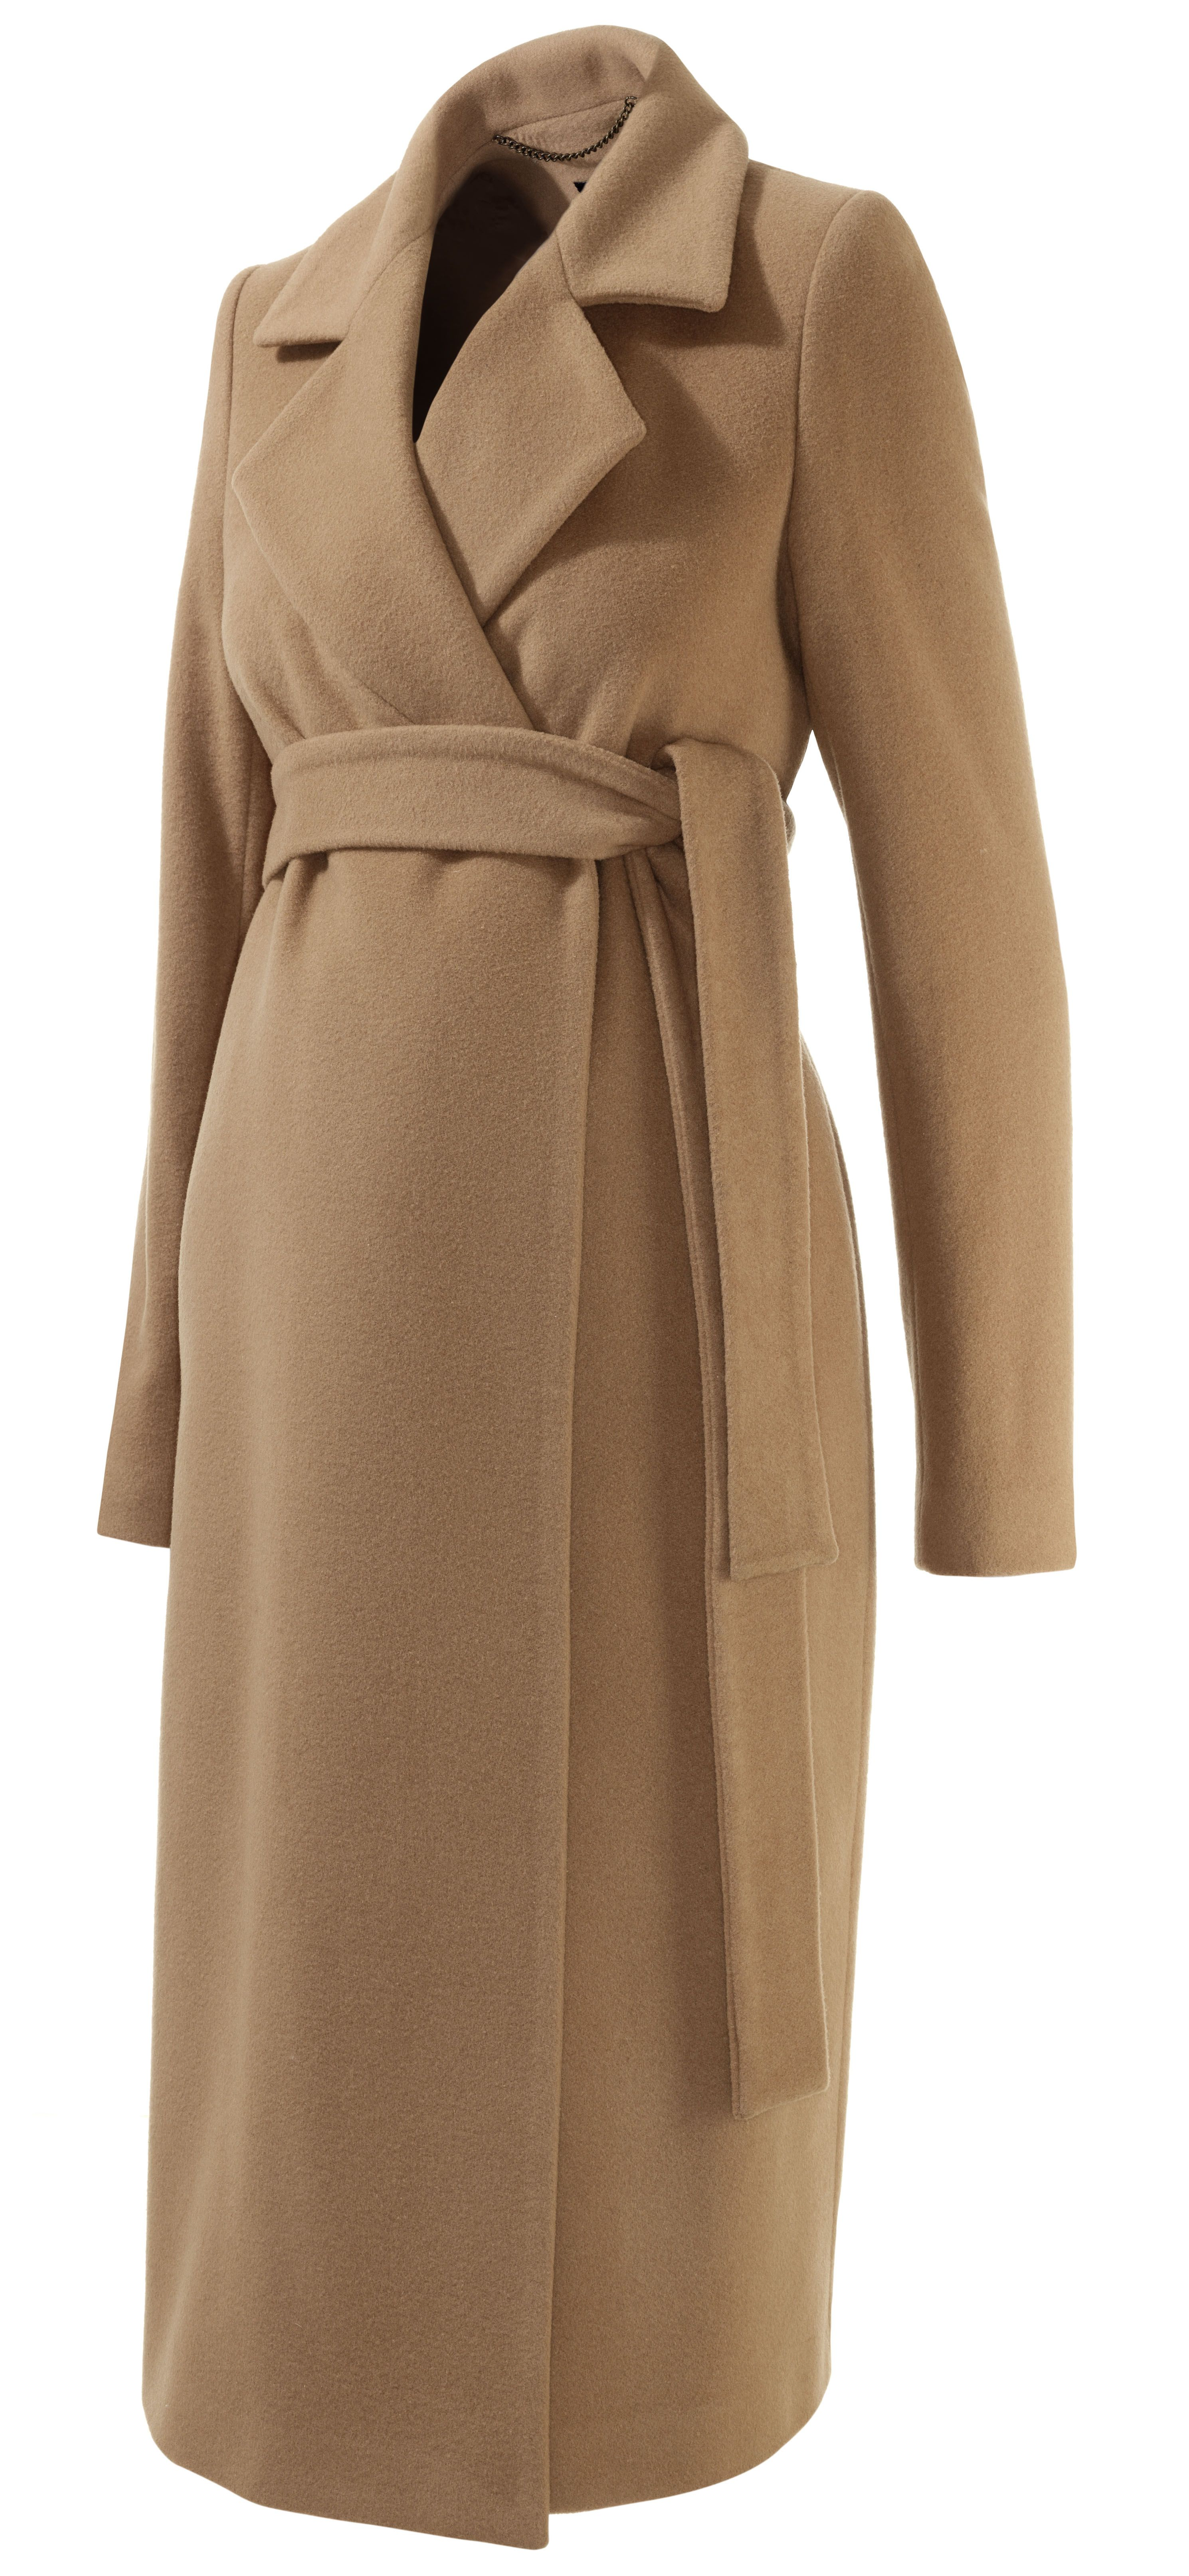 Isabella oliver luxe wrap coat maternity redefined pinterest isabella oliver luxe wrap coat maternity coatsmaternity stylewrap ombrellifo Images